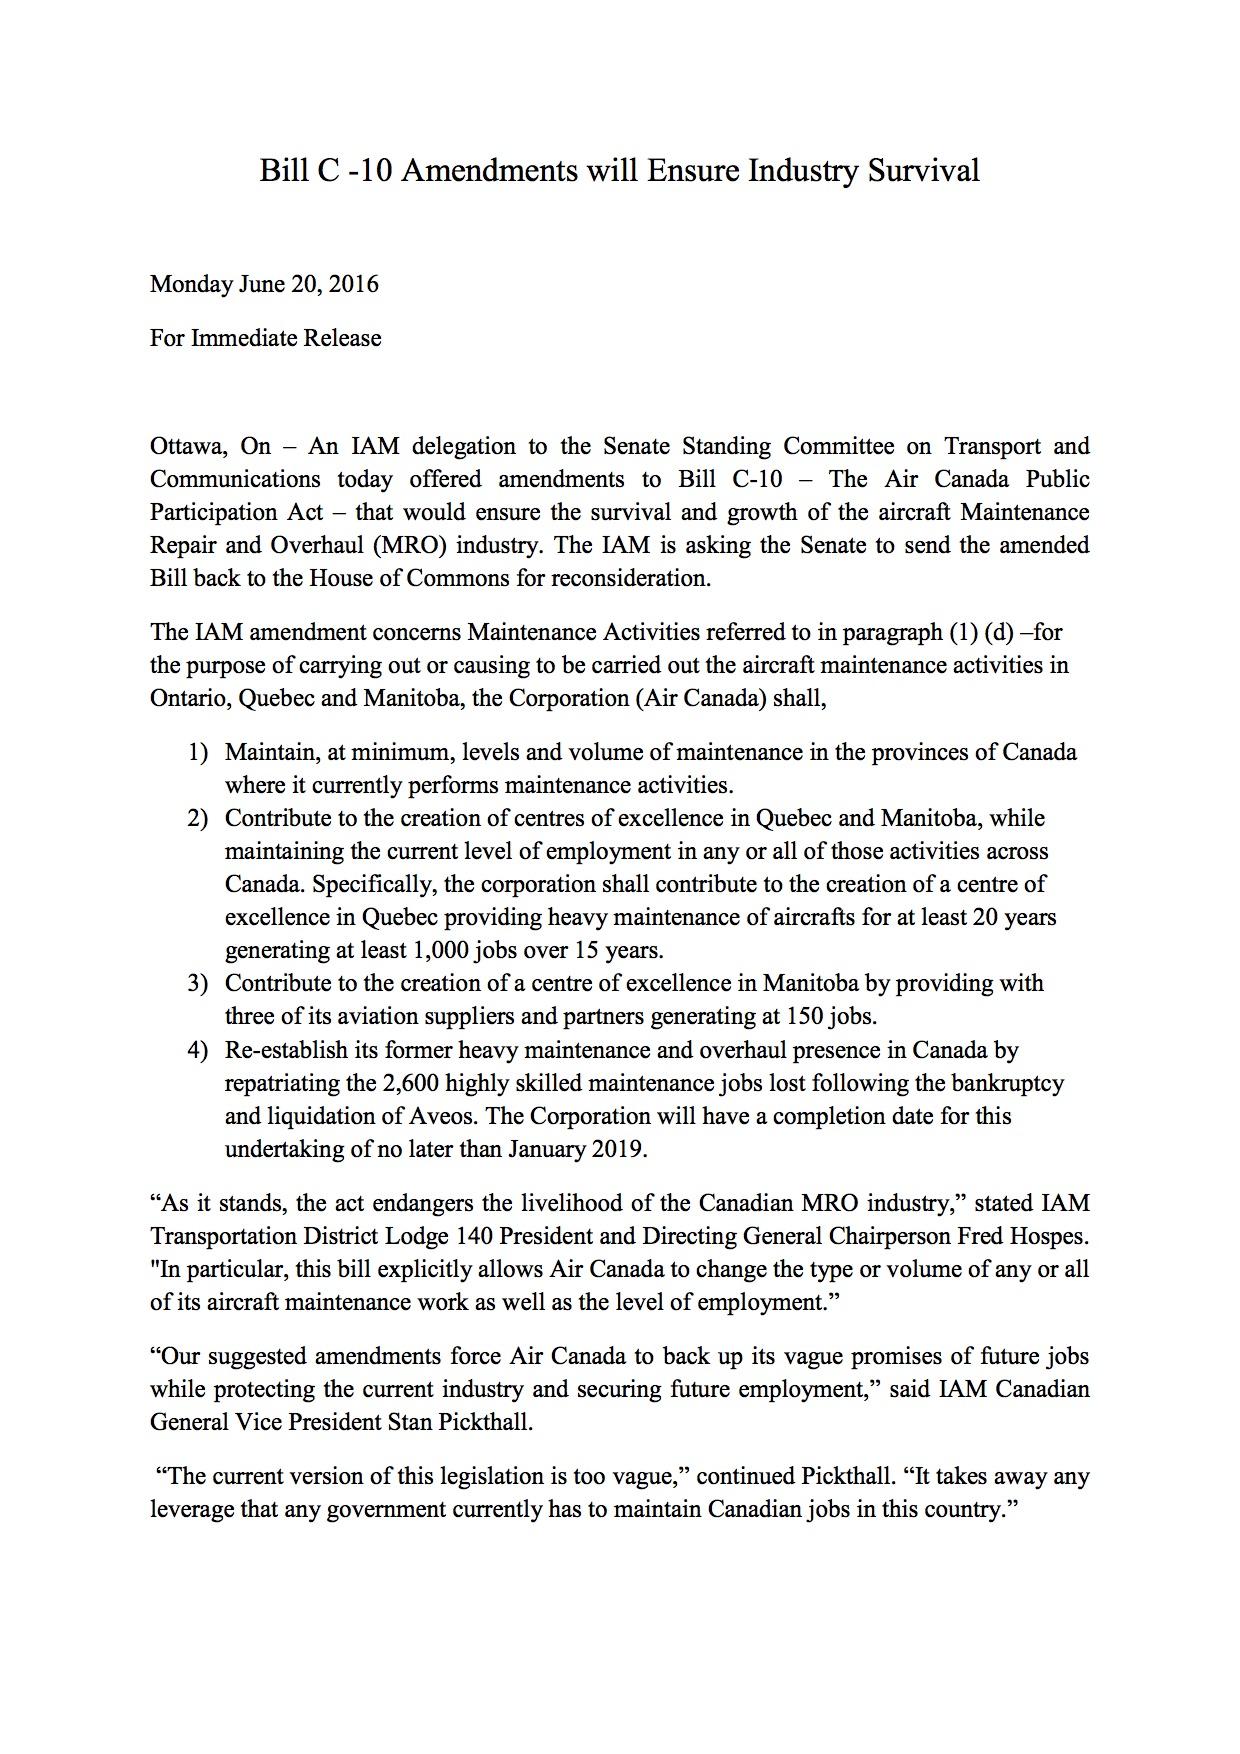 Bill C-10 release doc (2)